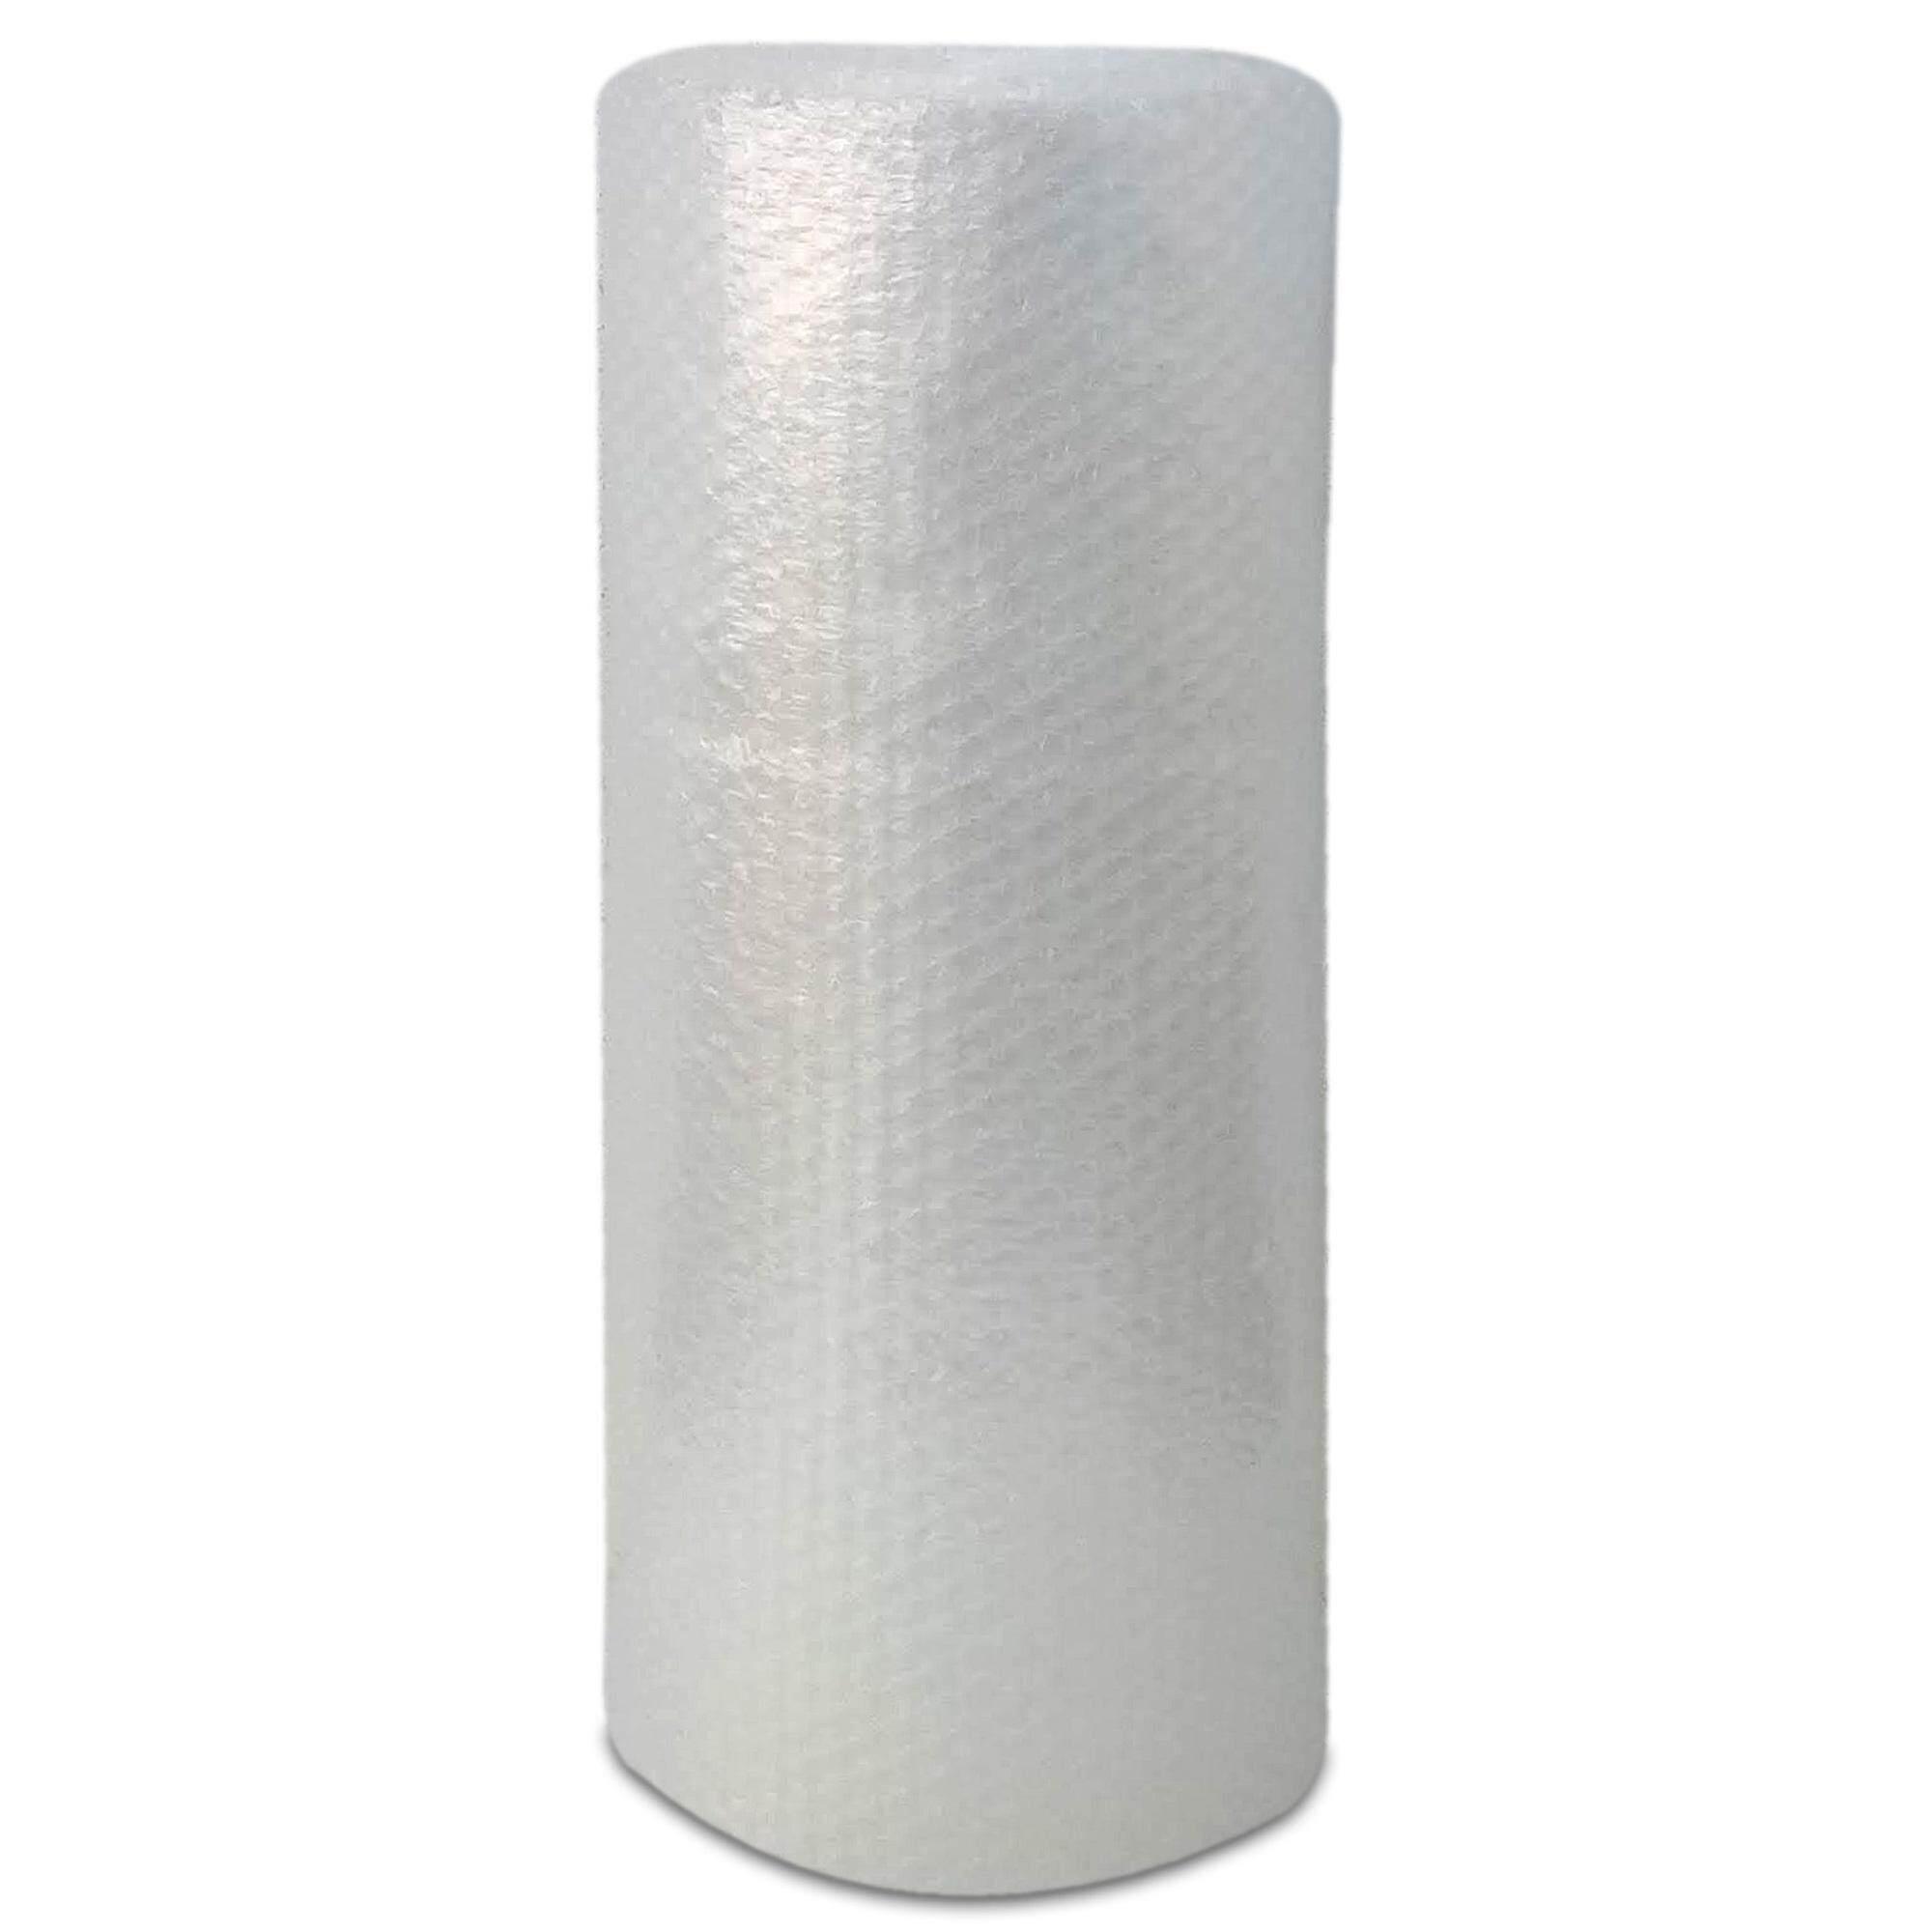 Bubble Wrap Best Quality 50cm X 10 Meters By Hello Shop.